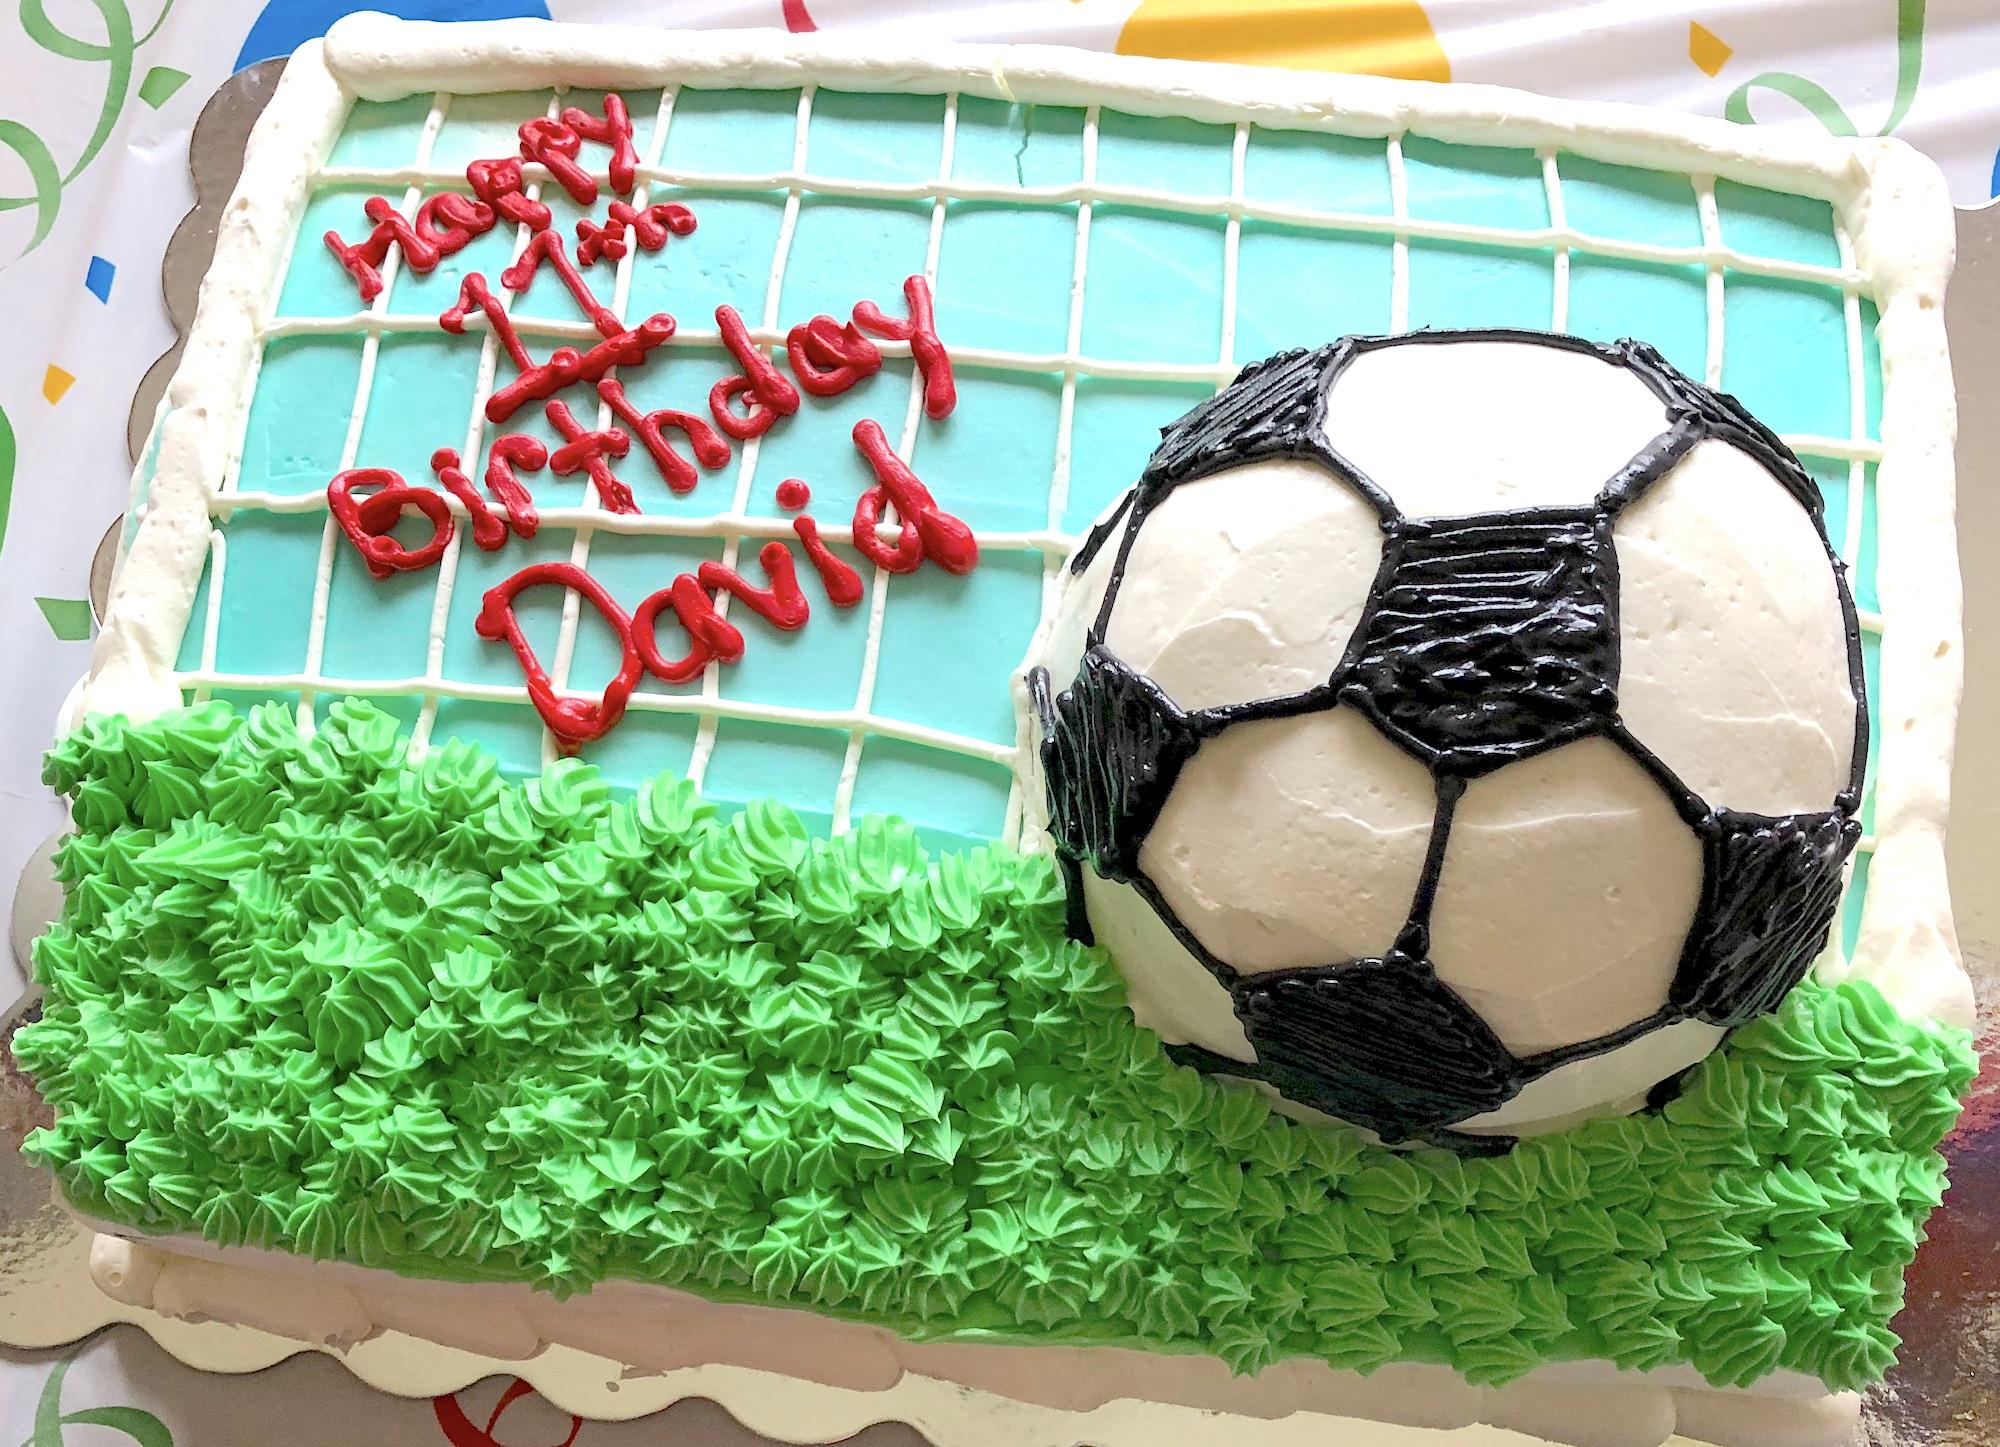 Marvelous Birthday Cake For A Future Soccer Champion Sugar Shack Funny Birthday Cards Online Aboleapandamsfinfo